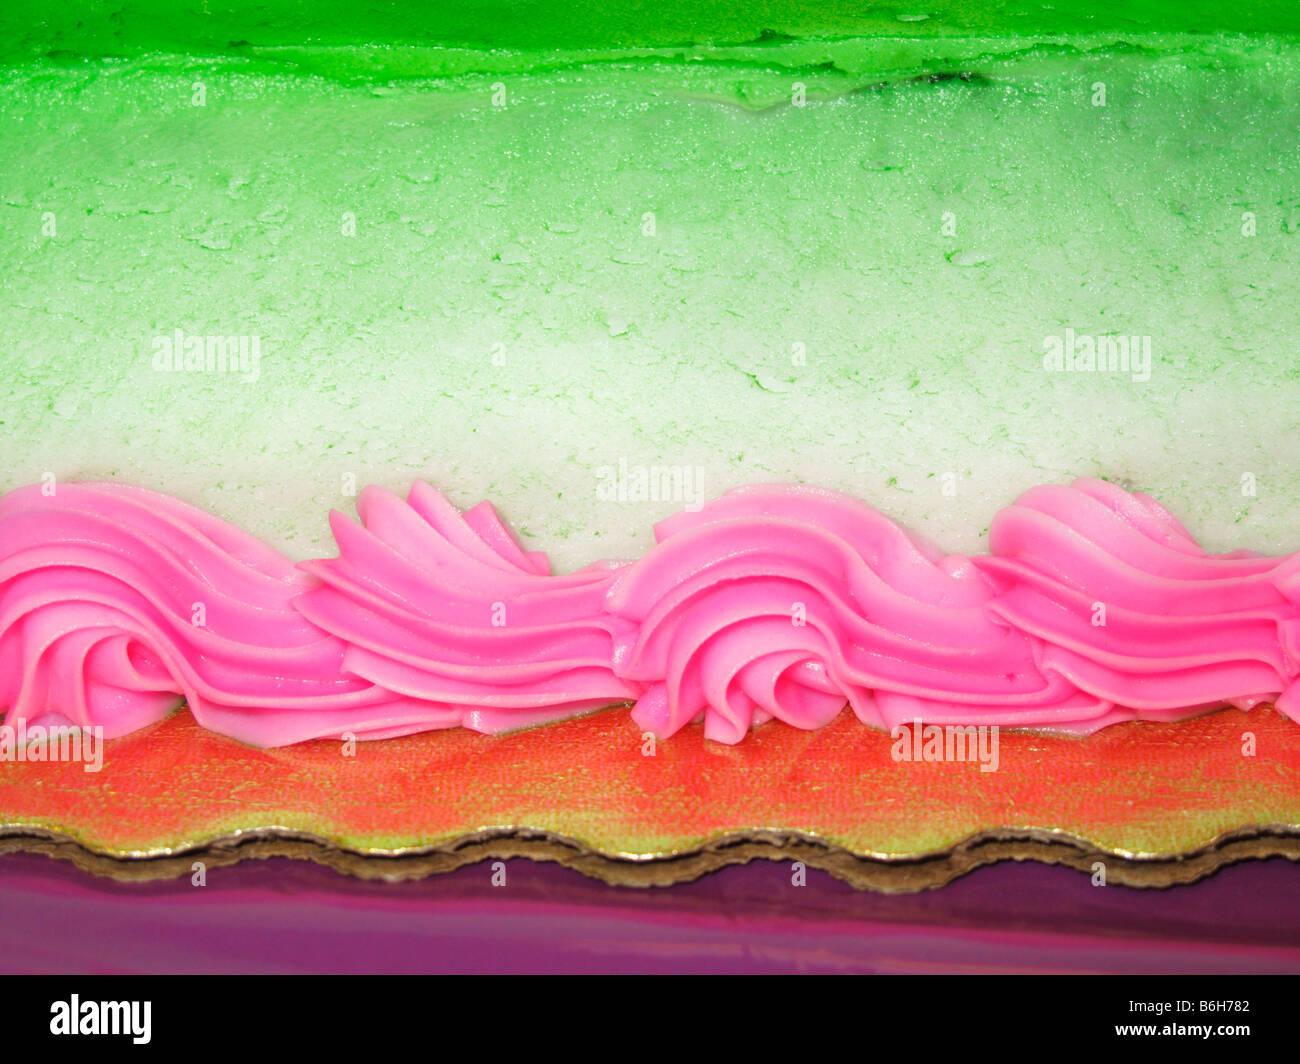 Closeup of bright cake decorations - Stock Image